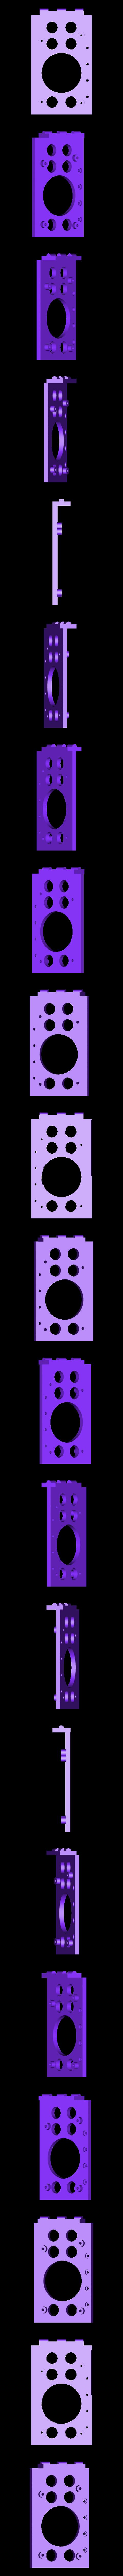 Arduino_RAMPS_Holder.stl Download STL file Diamond hot end extruder extender holder and install tutorial • 3D printing template, ebraiman